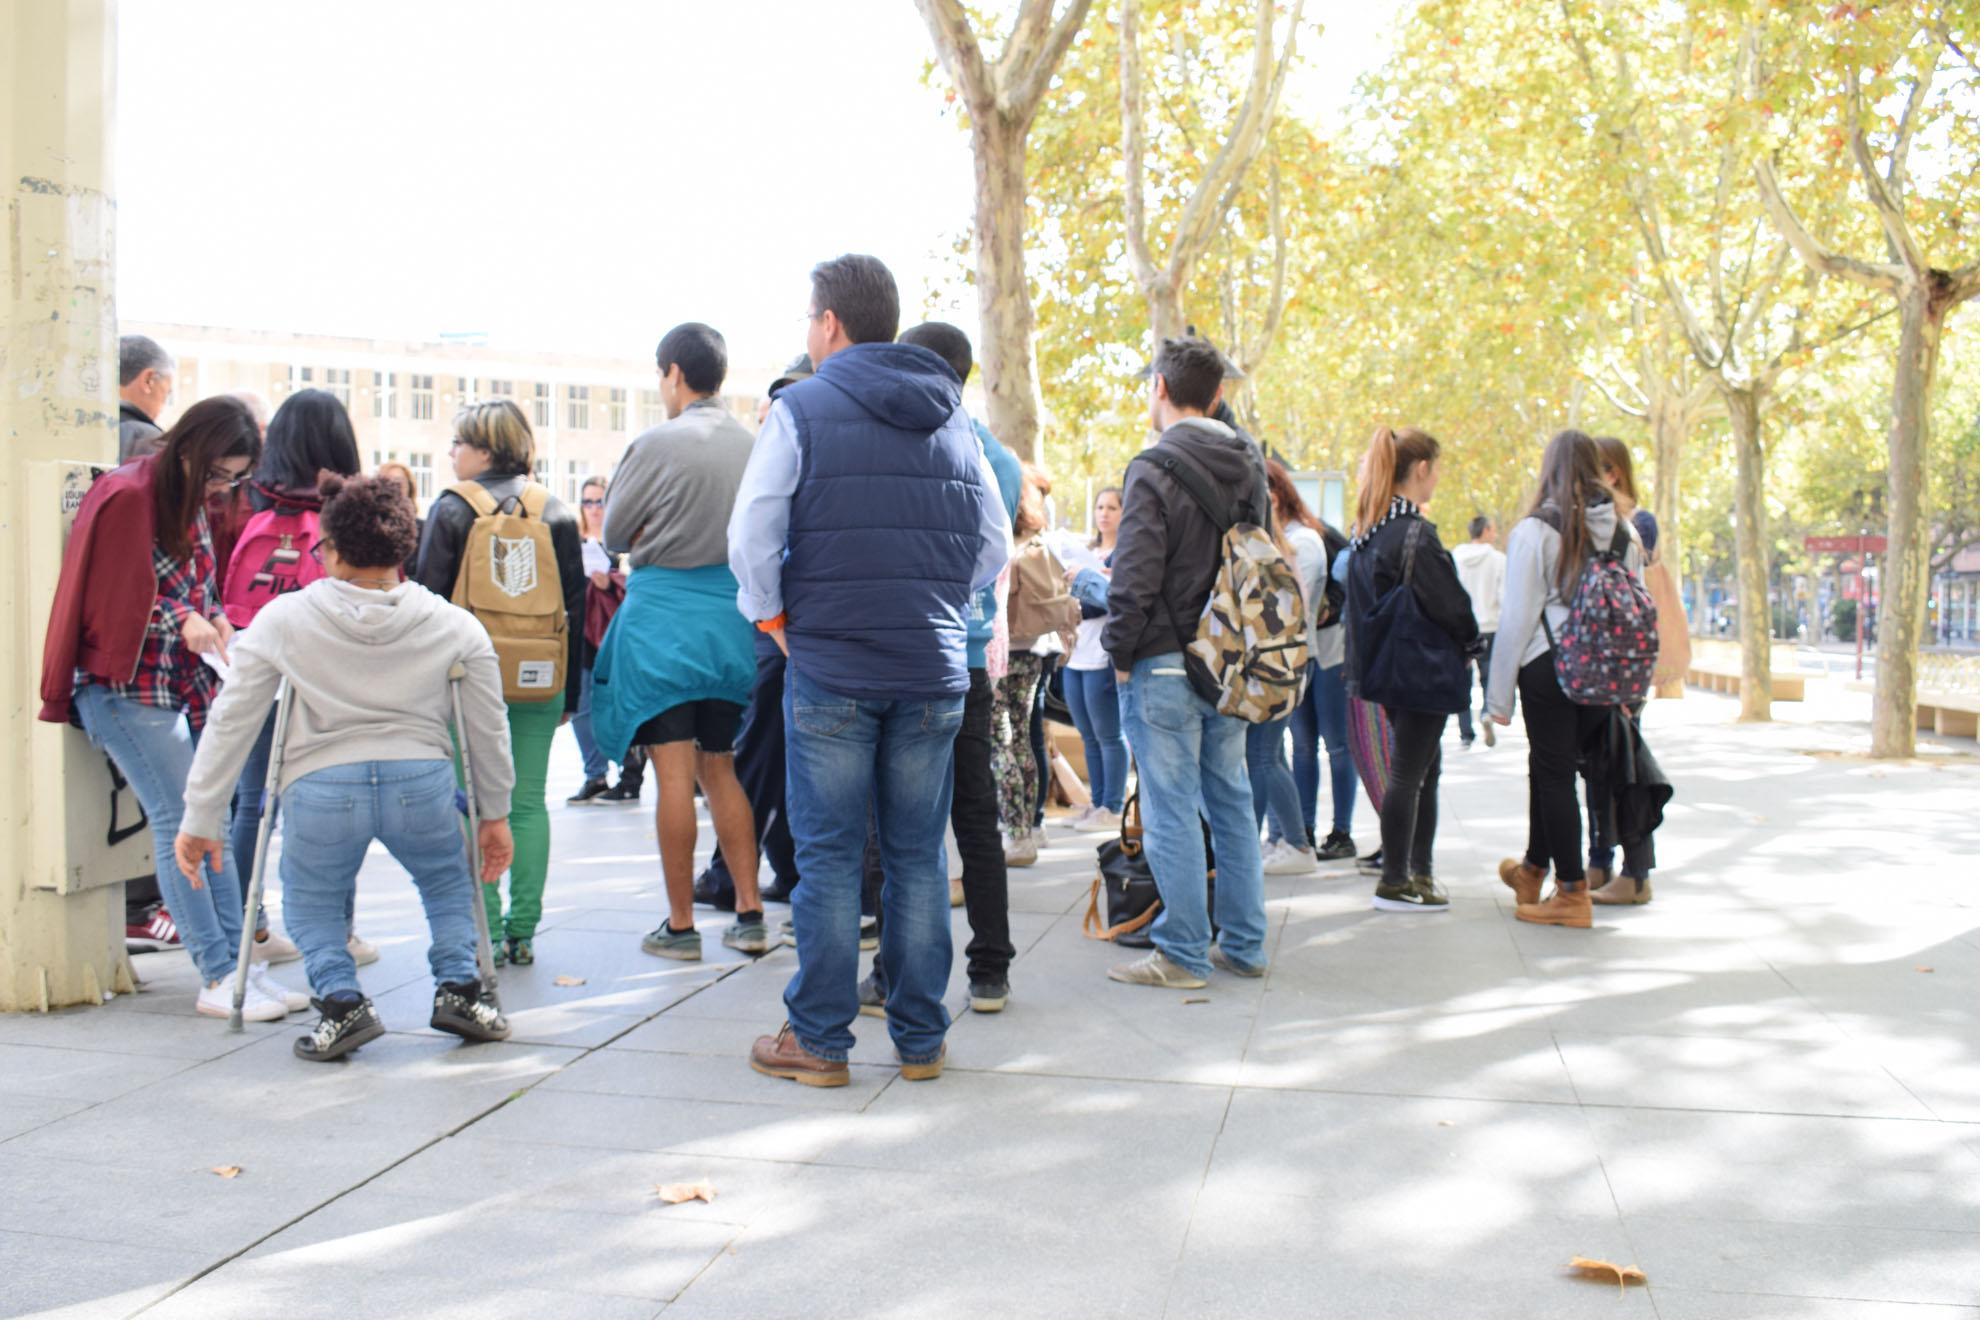 SEMANA-ARQUITECTURA-COAR-FCAR-paseo-espolon-glorieta-plaza-ayuntamiento-jose-miguel-leon (22)